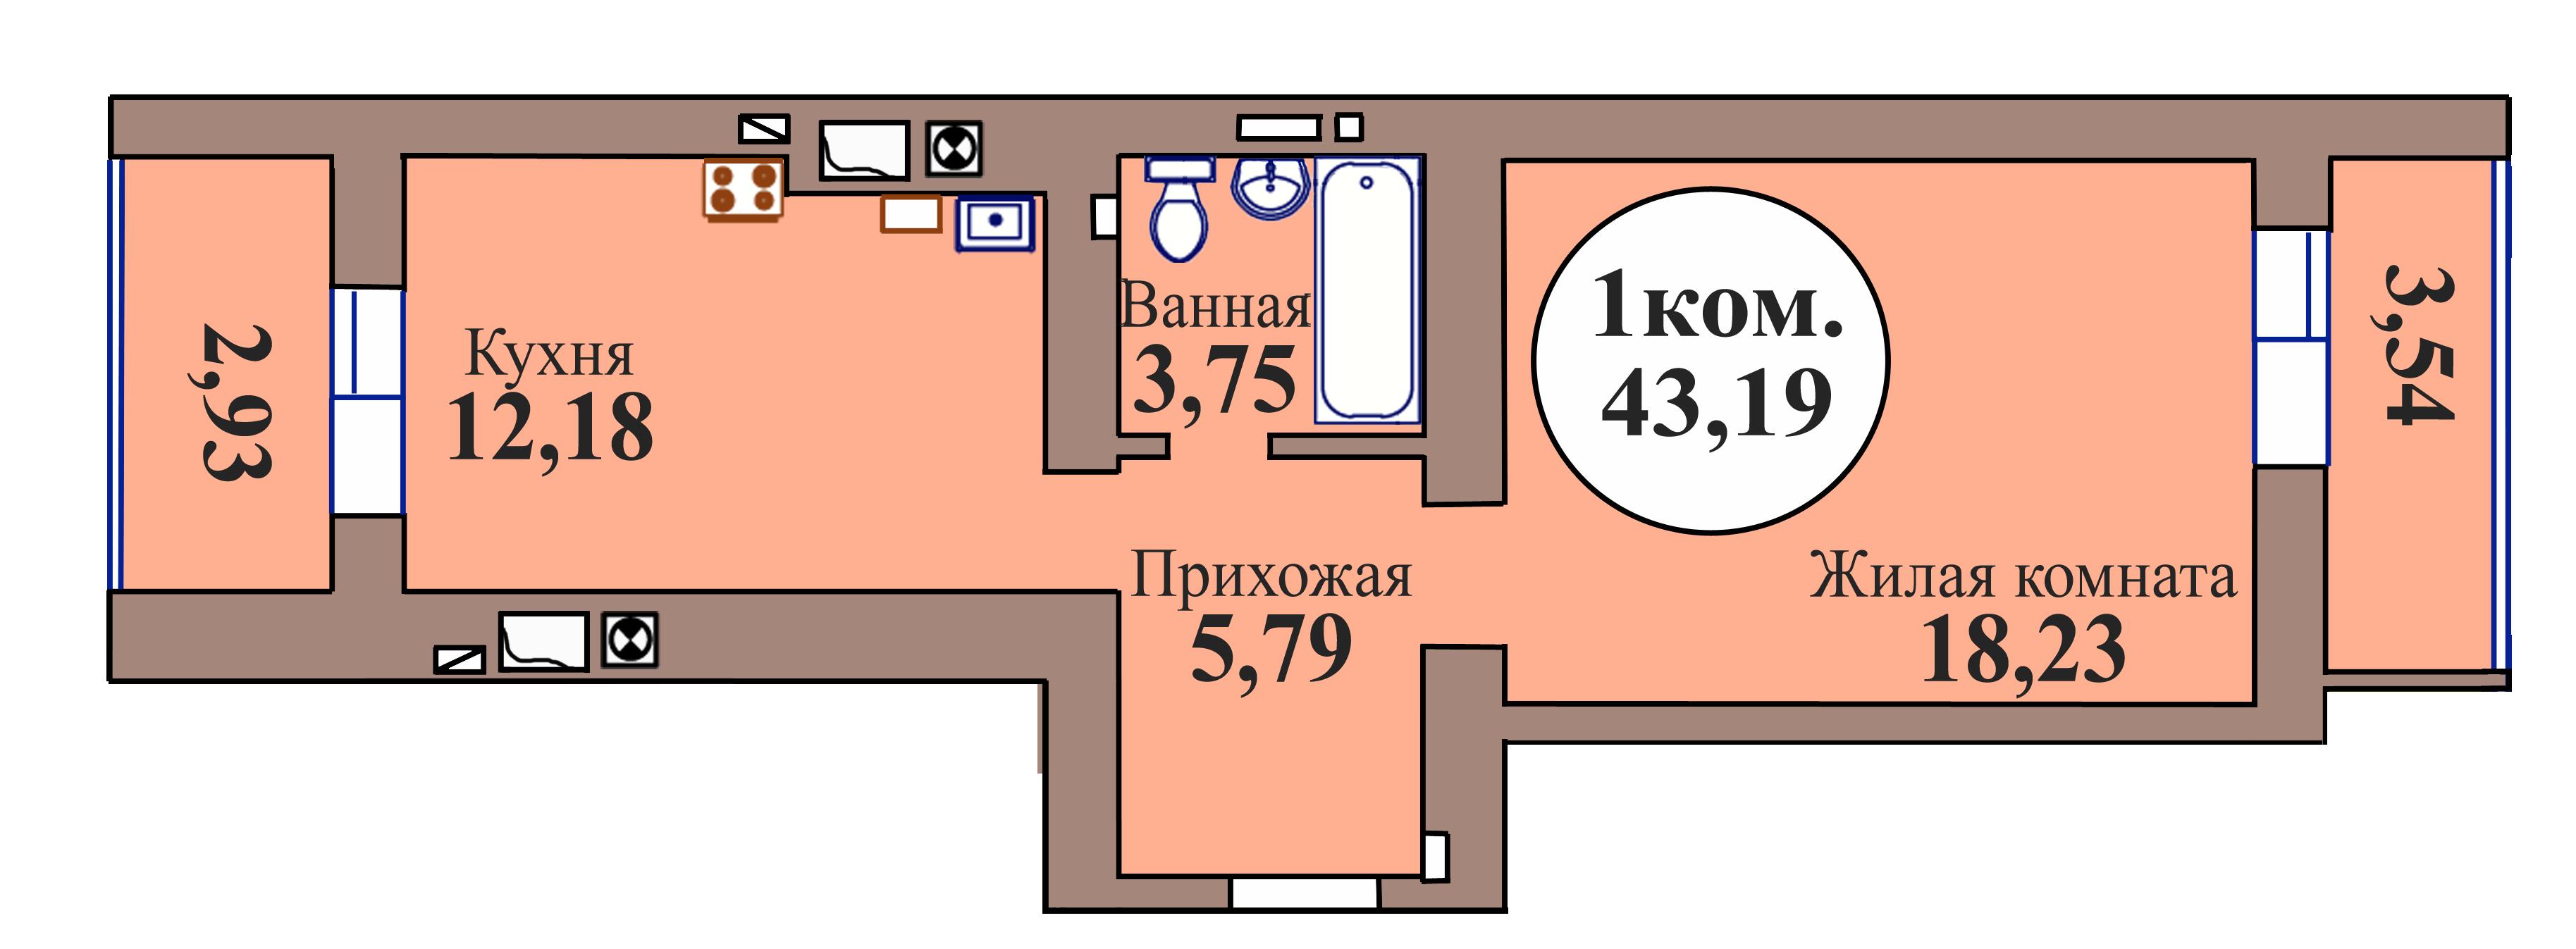 1-комн. кв. по пер. Калининградский, 5 кв. 79 в Калининграде